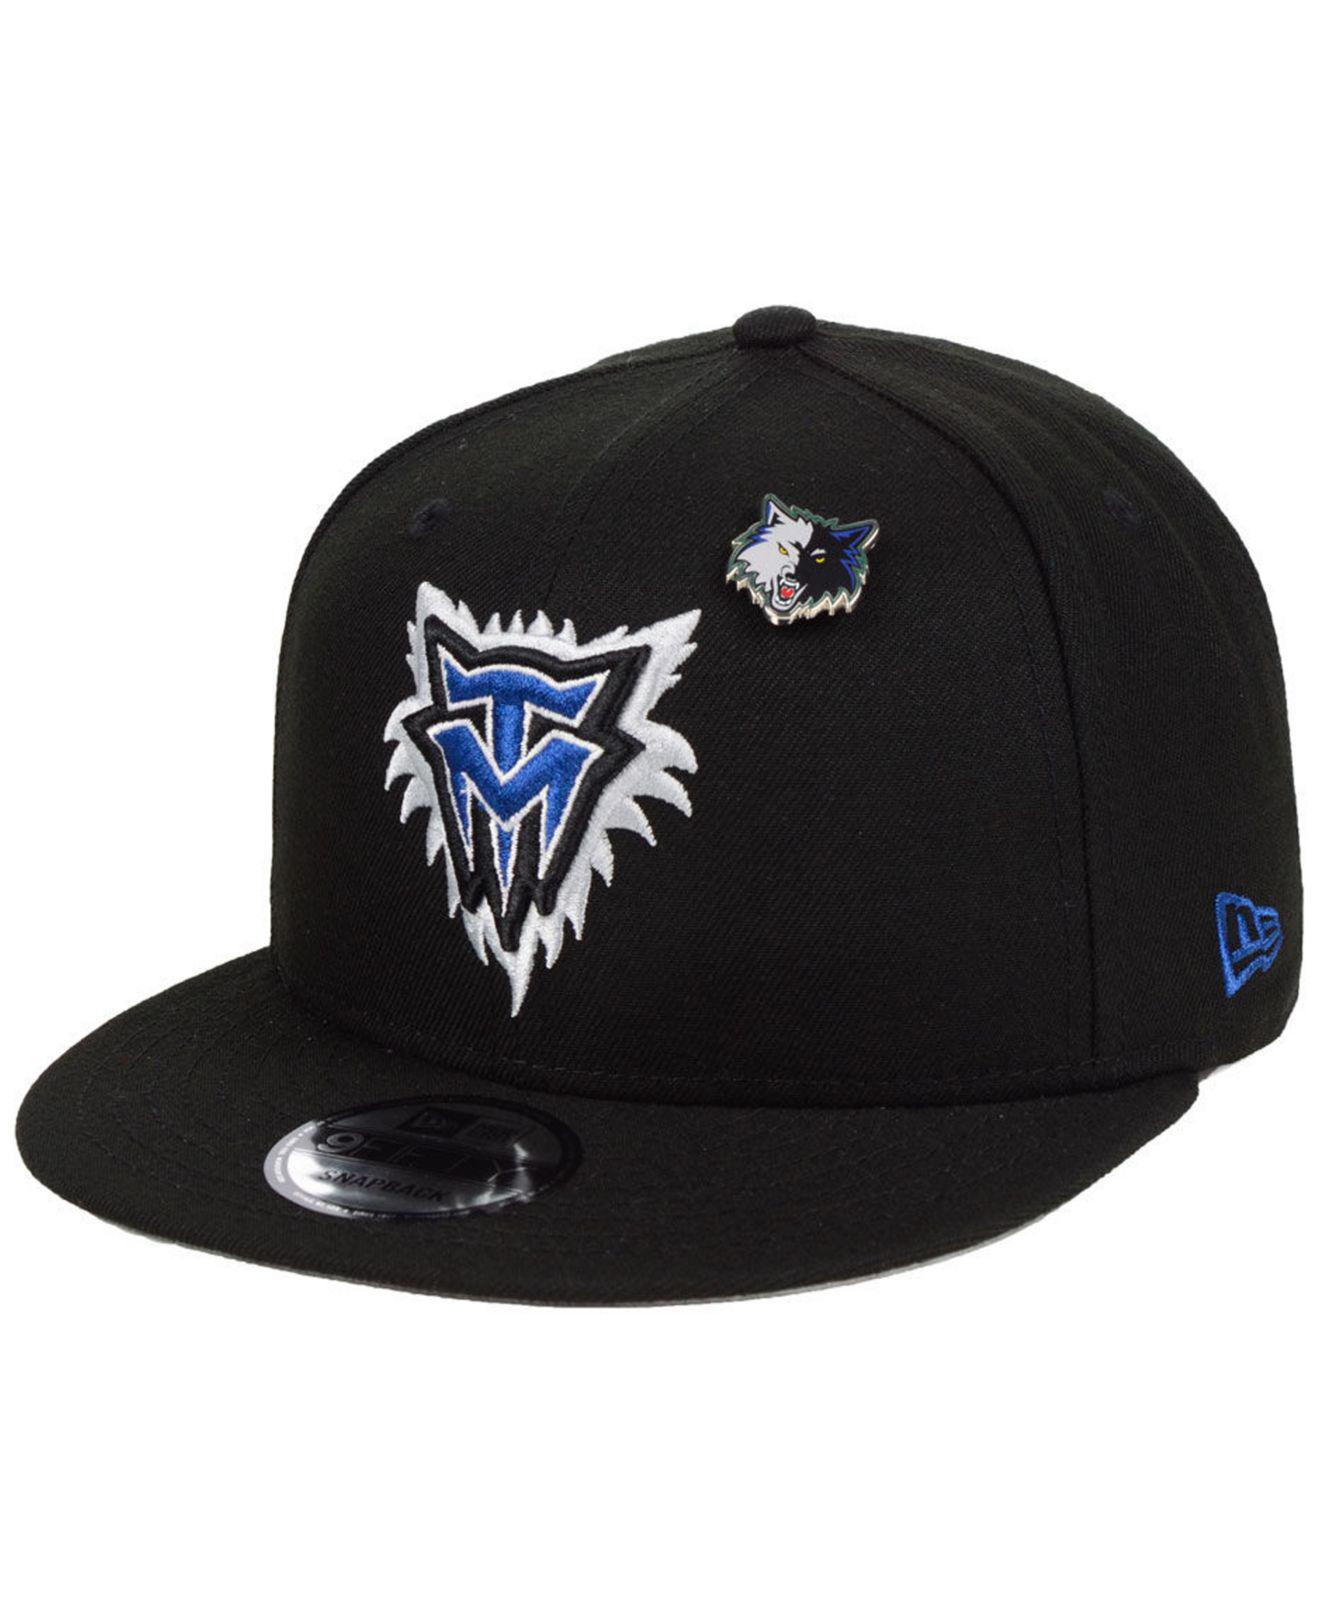 KTZ. Men s Black Minnesota Timberwolves Hardwood Classic Nights Pin 9fifty  Snapback Cap c9e8d6812